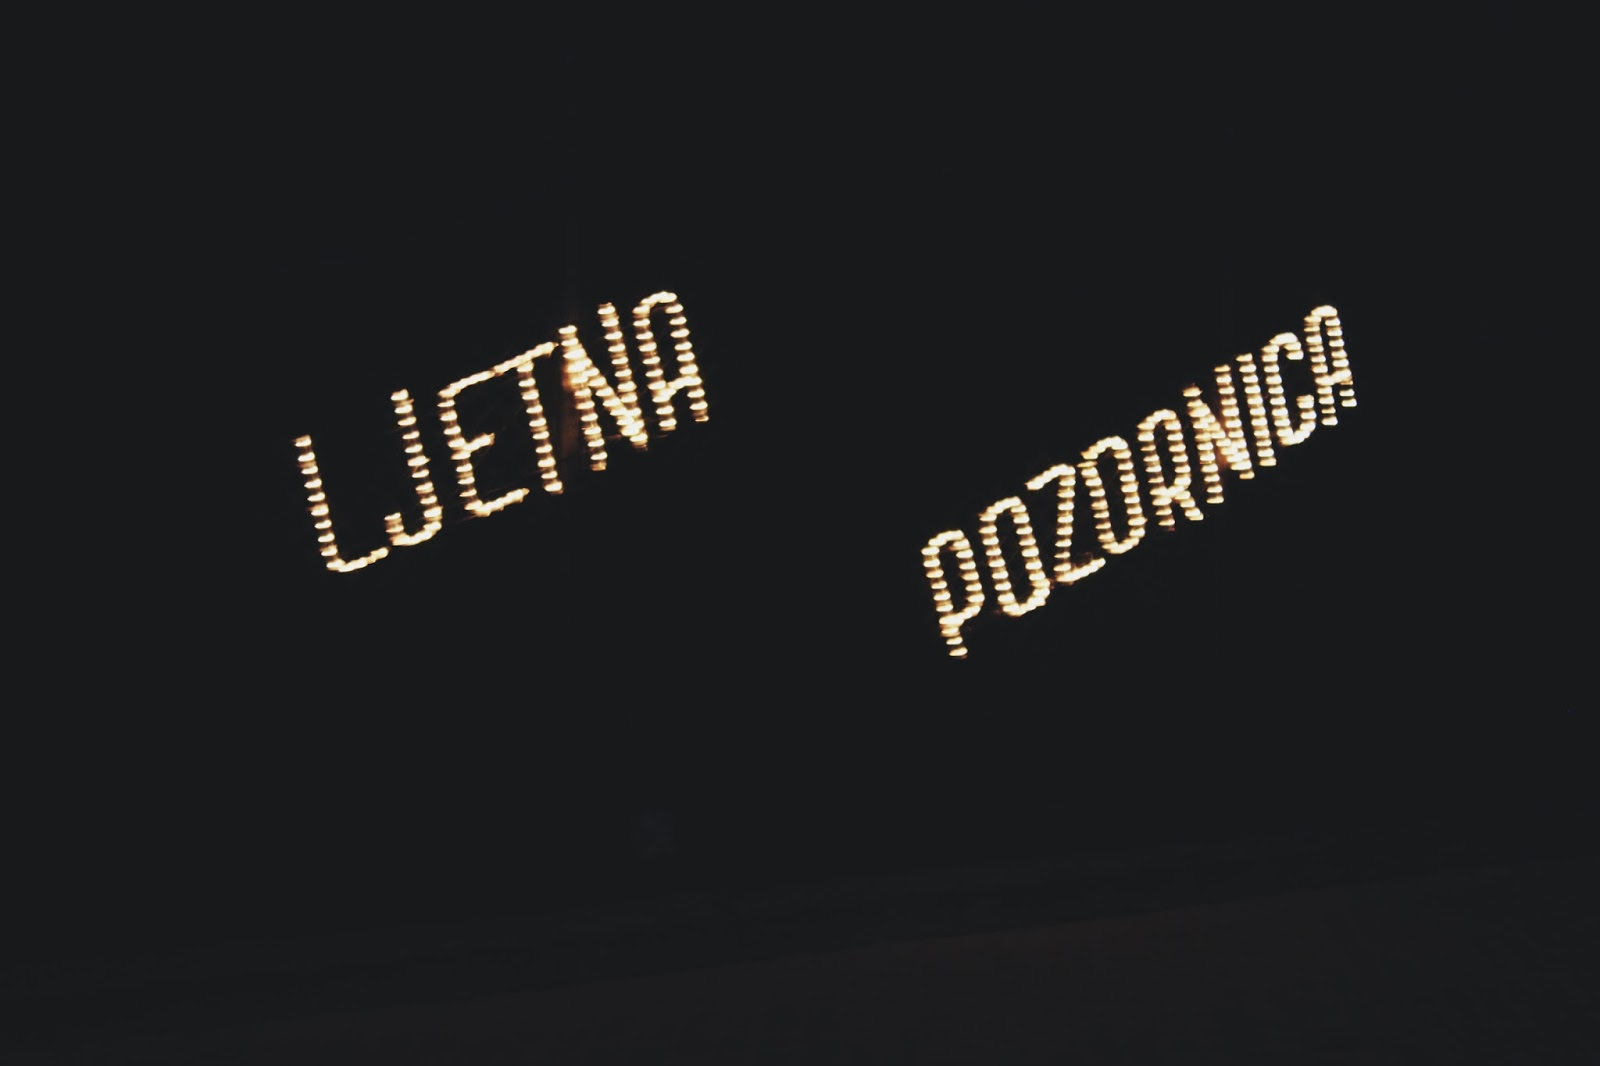 filipa canic blog, youarethepoet, you are the poet blog, retro opatija 2016, opatija, photography